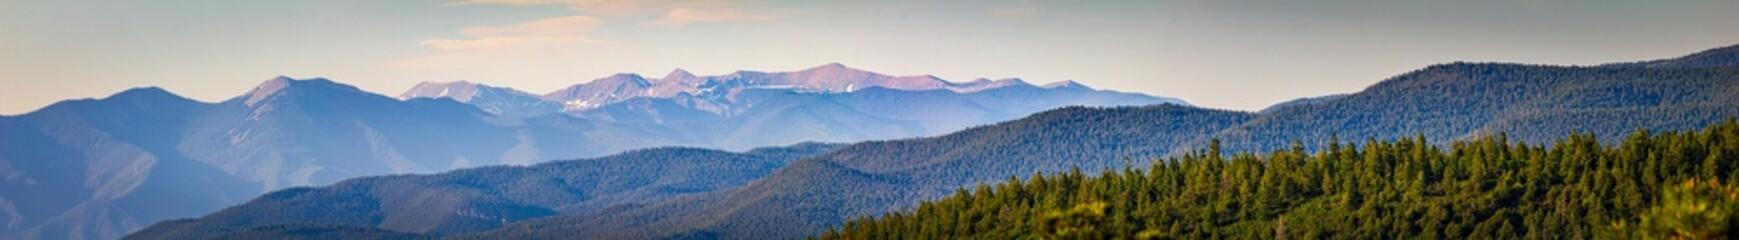 Printed roller blinds Panorama Photos Colorado mountain range panorama